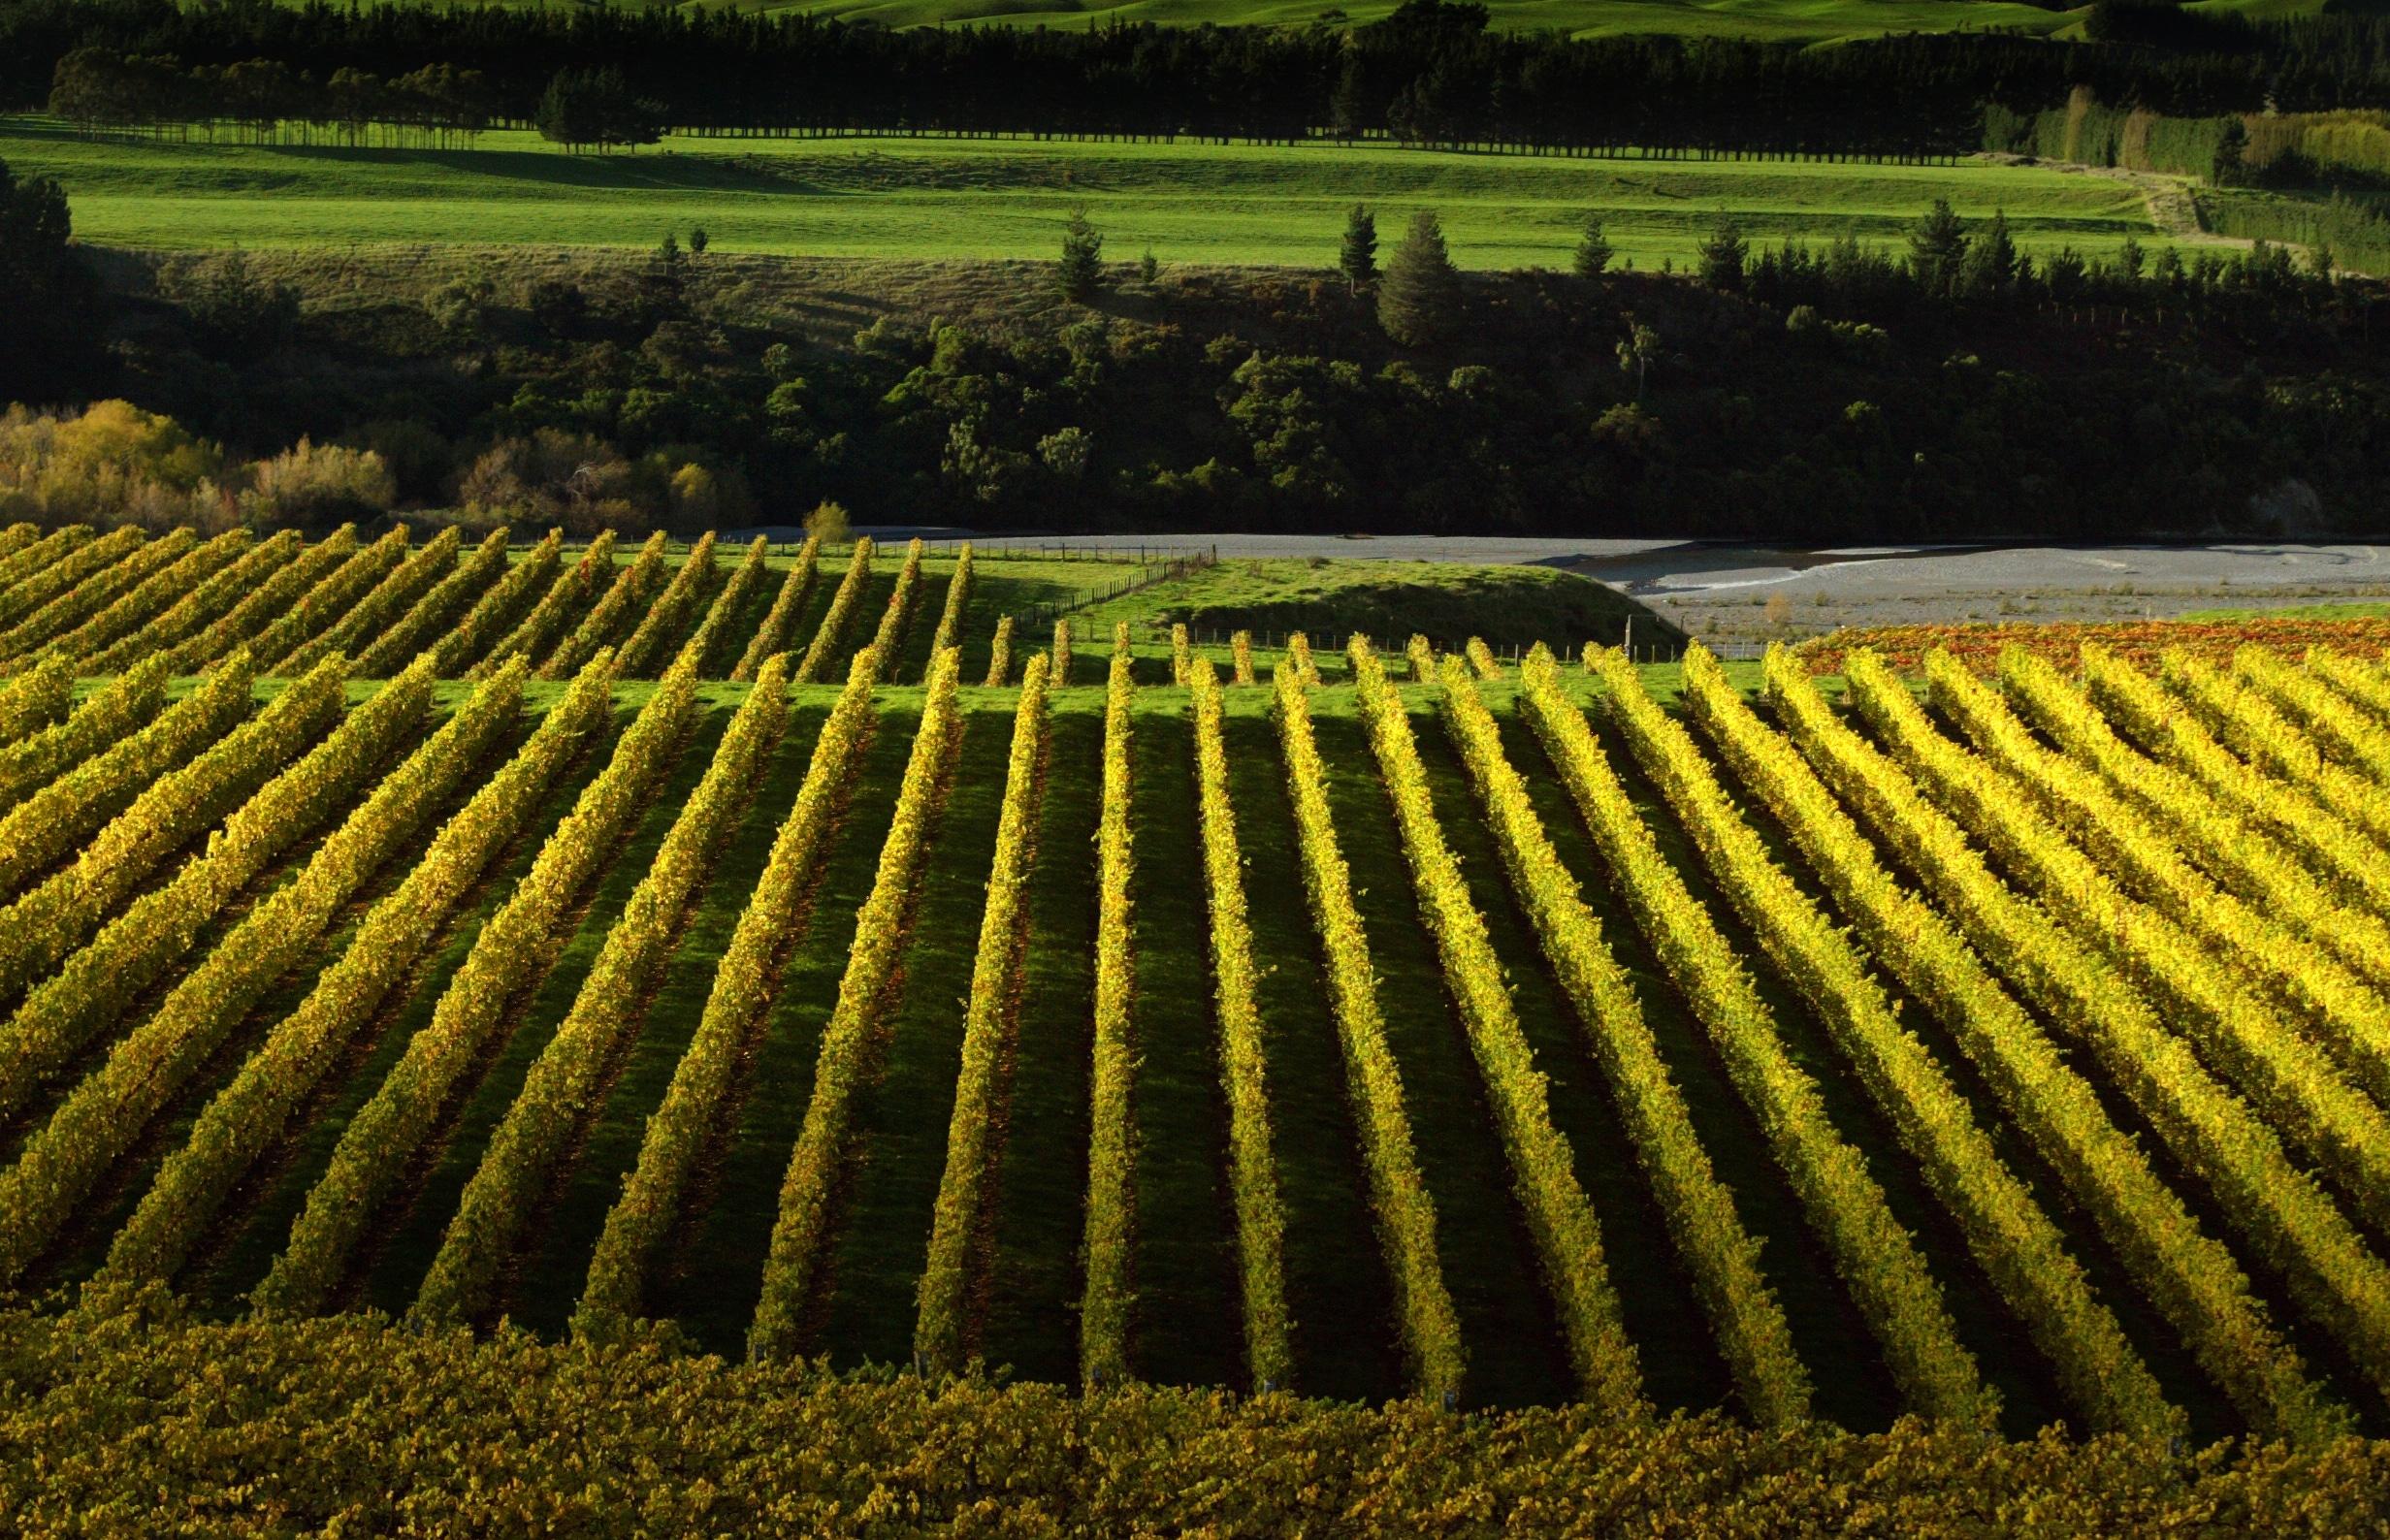 Autumn Colours Feature Mangatahi vineyards surrender to Autumn Colour. Rep - Pic By Warren Buckland Hawkes Bay Today - NAPIER NEWS FEATURE DIGITAL PHOTO